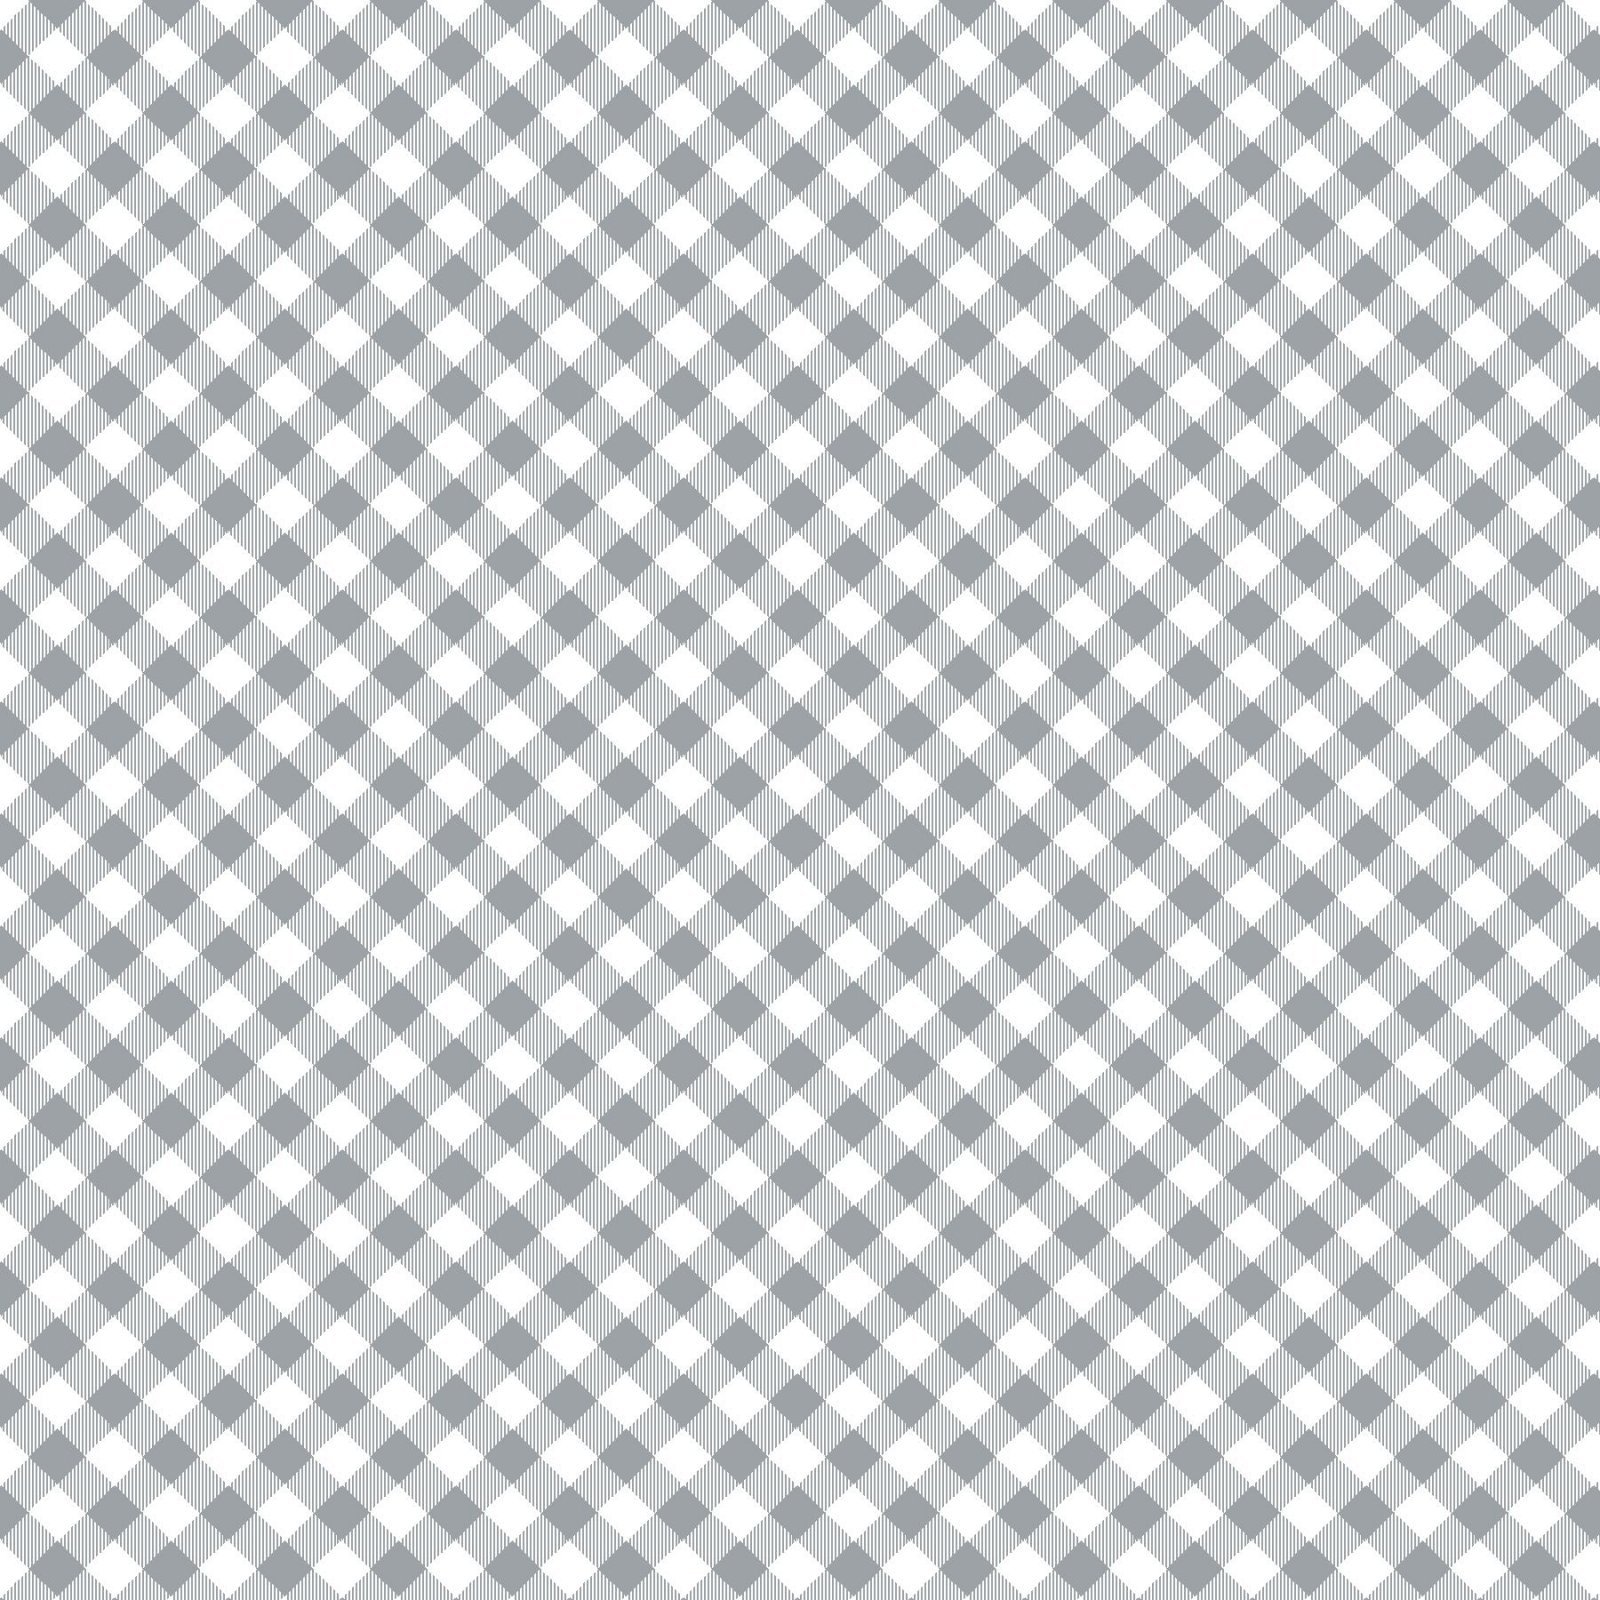 HG-Chelsea's Checks 9700-90 Gray - 1/8 Check